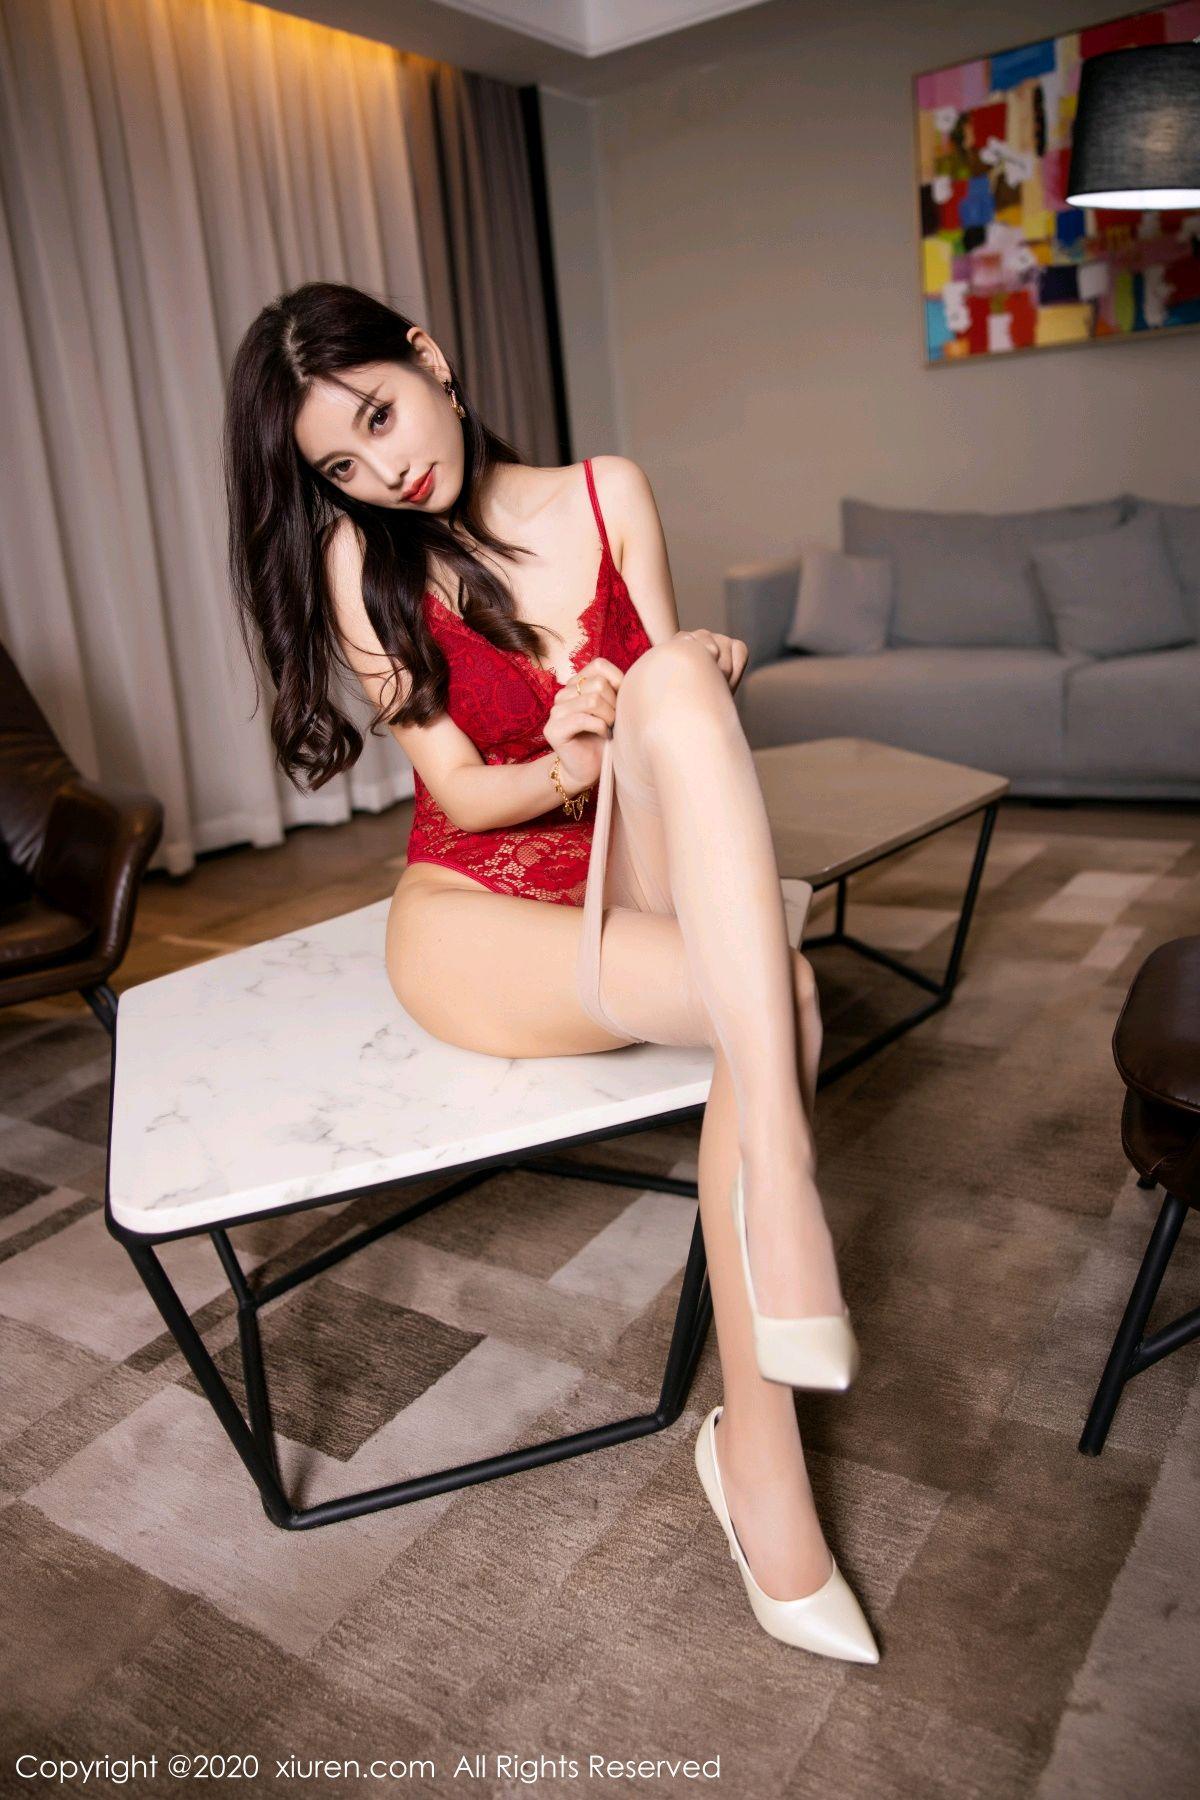 [XiuRen] Vol.2671 Yang Chen Chen 63P, Underwear, Xiuren, Yang Chen Chen